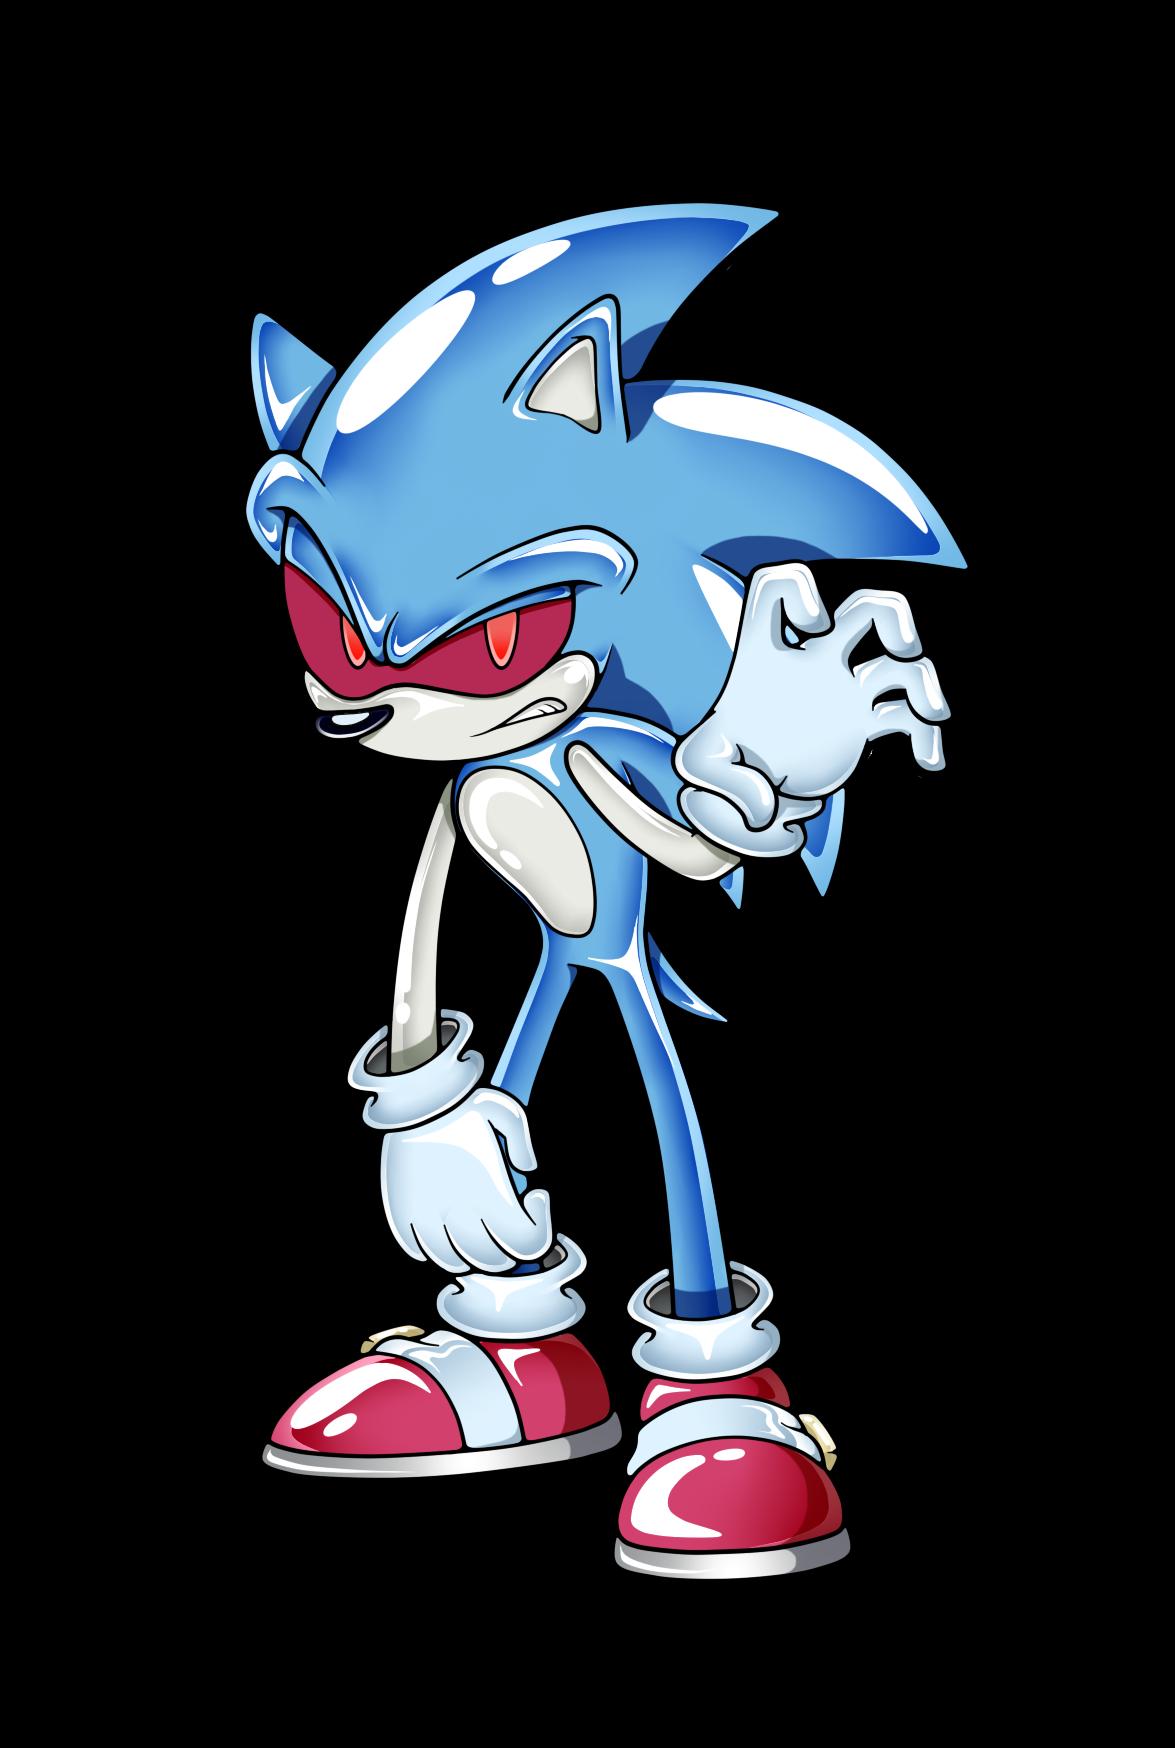 Zombot Sonic Adventure Style By Sarkenthehedgehog On Deviantart